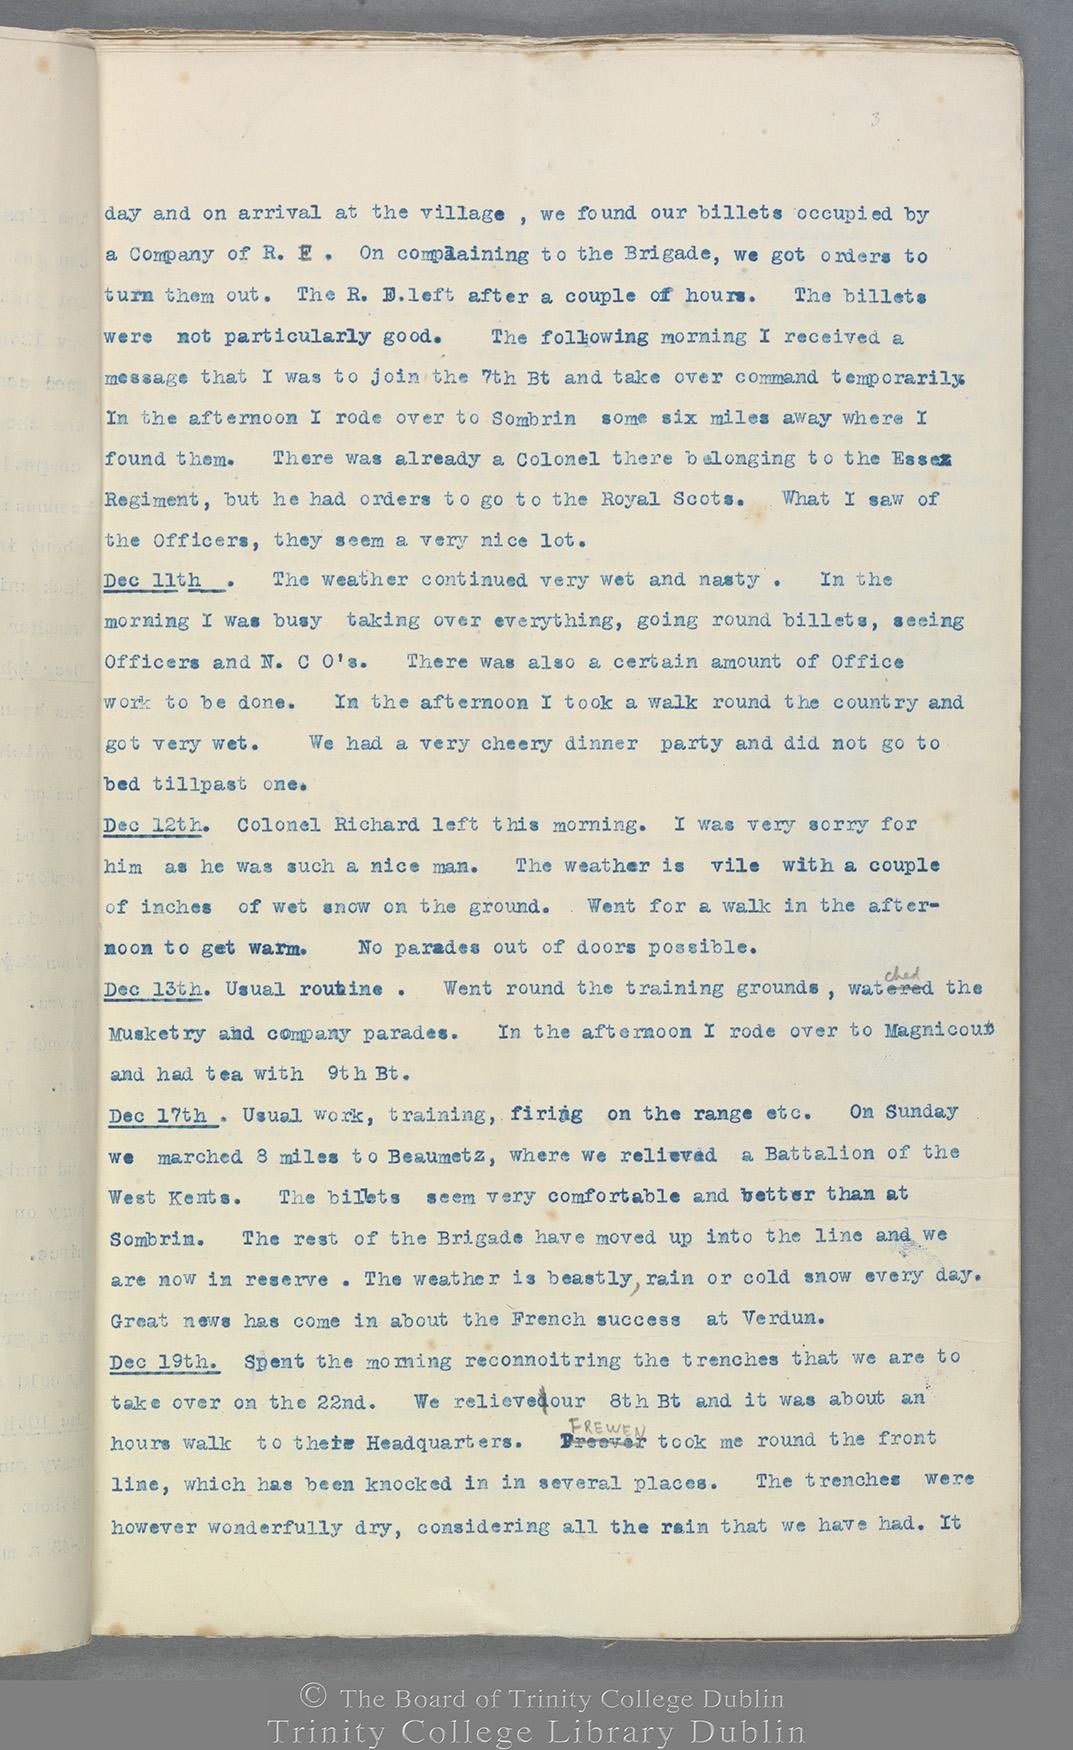 TCD MS 10822 folio 3 recto